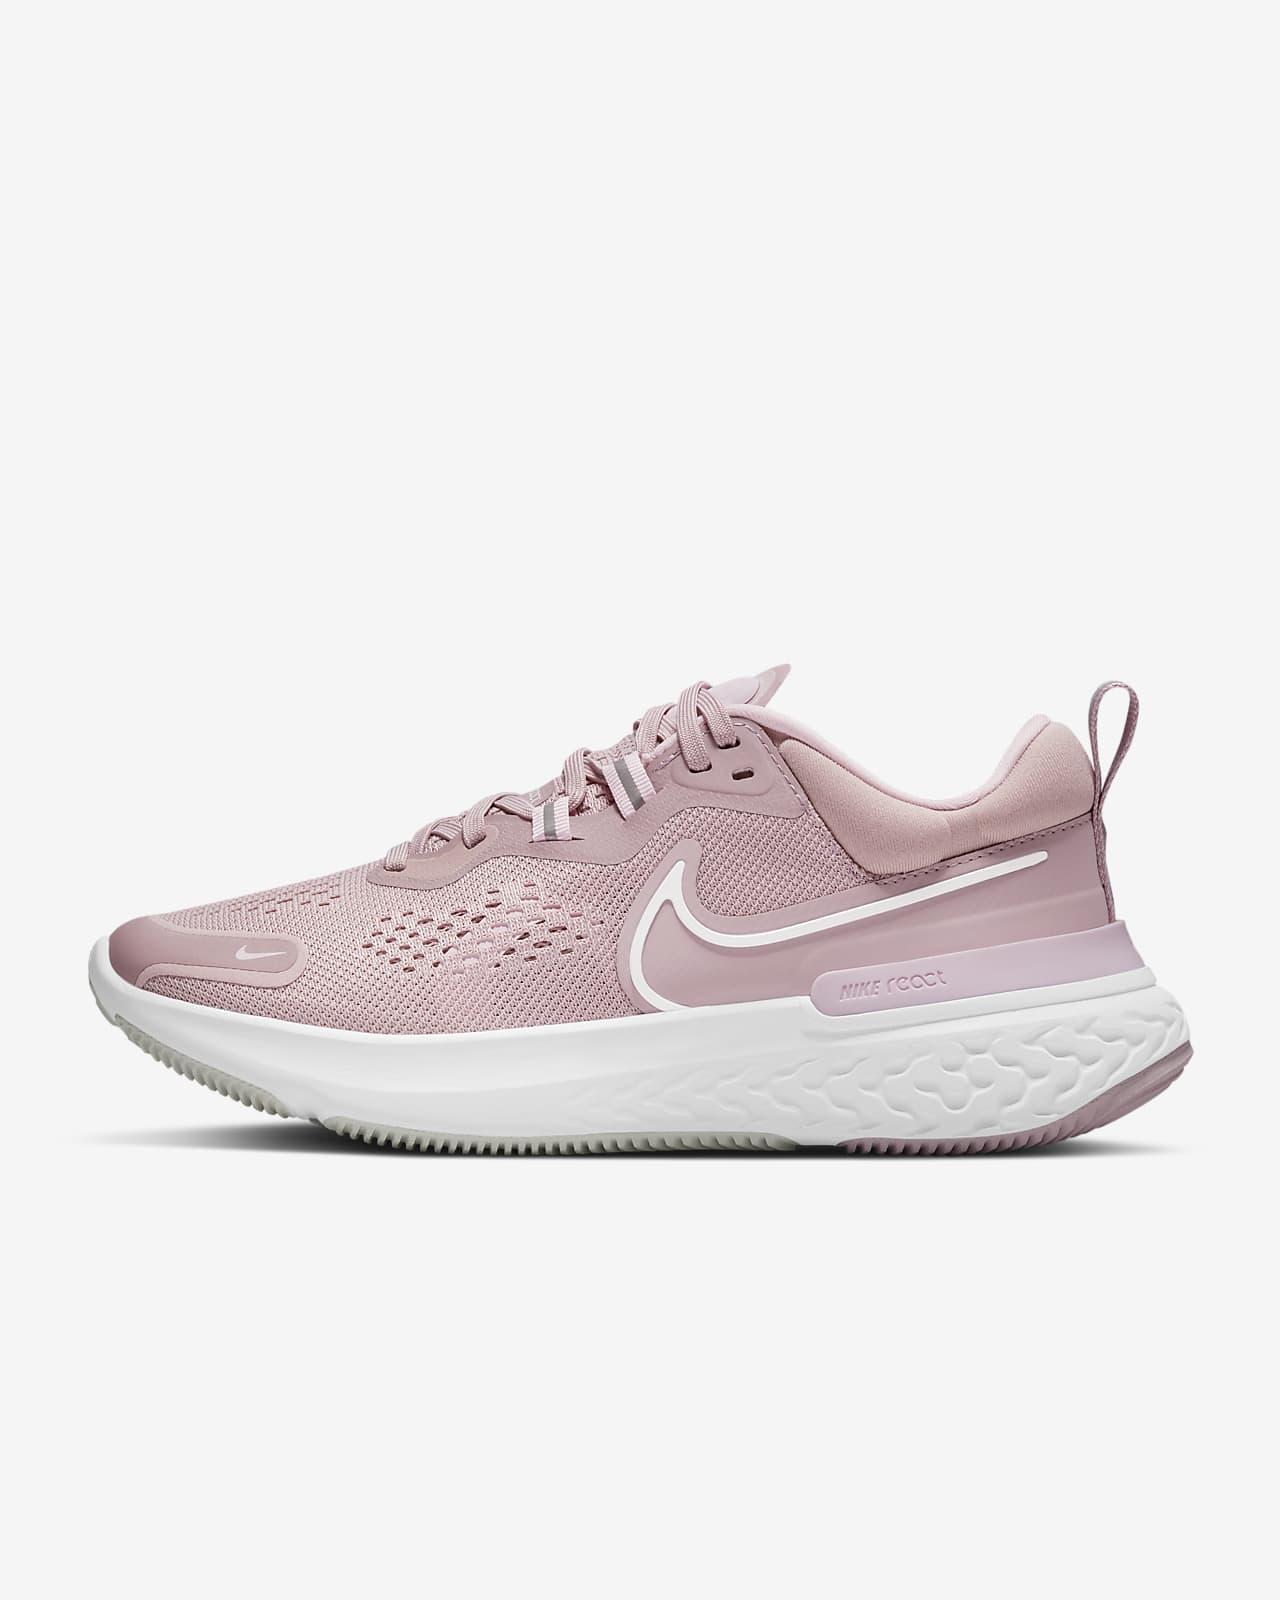 Nike React Miler 2 Women's Road Running Shoes